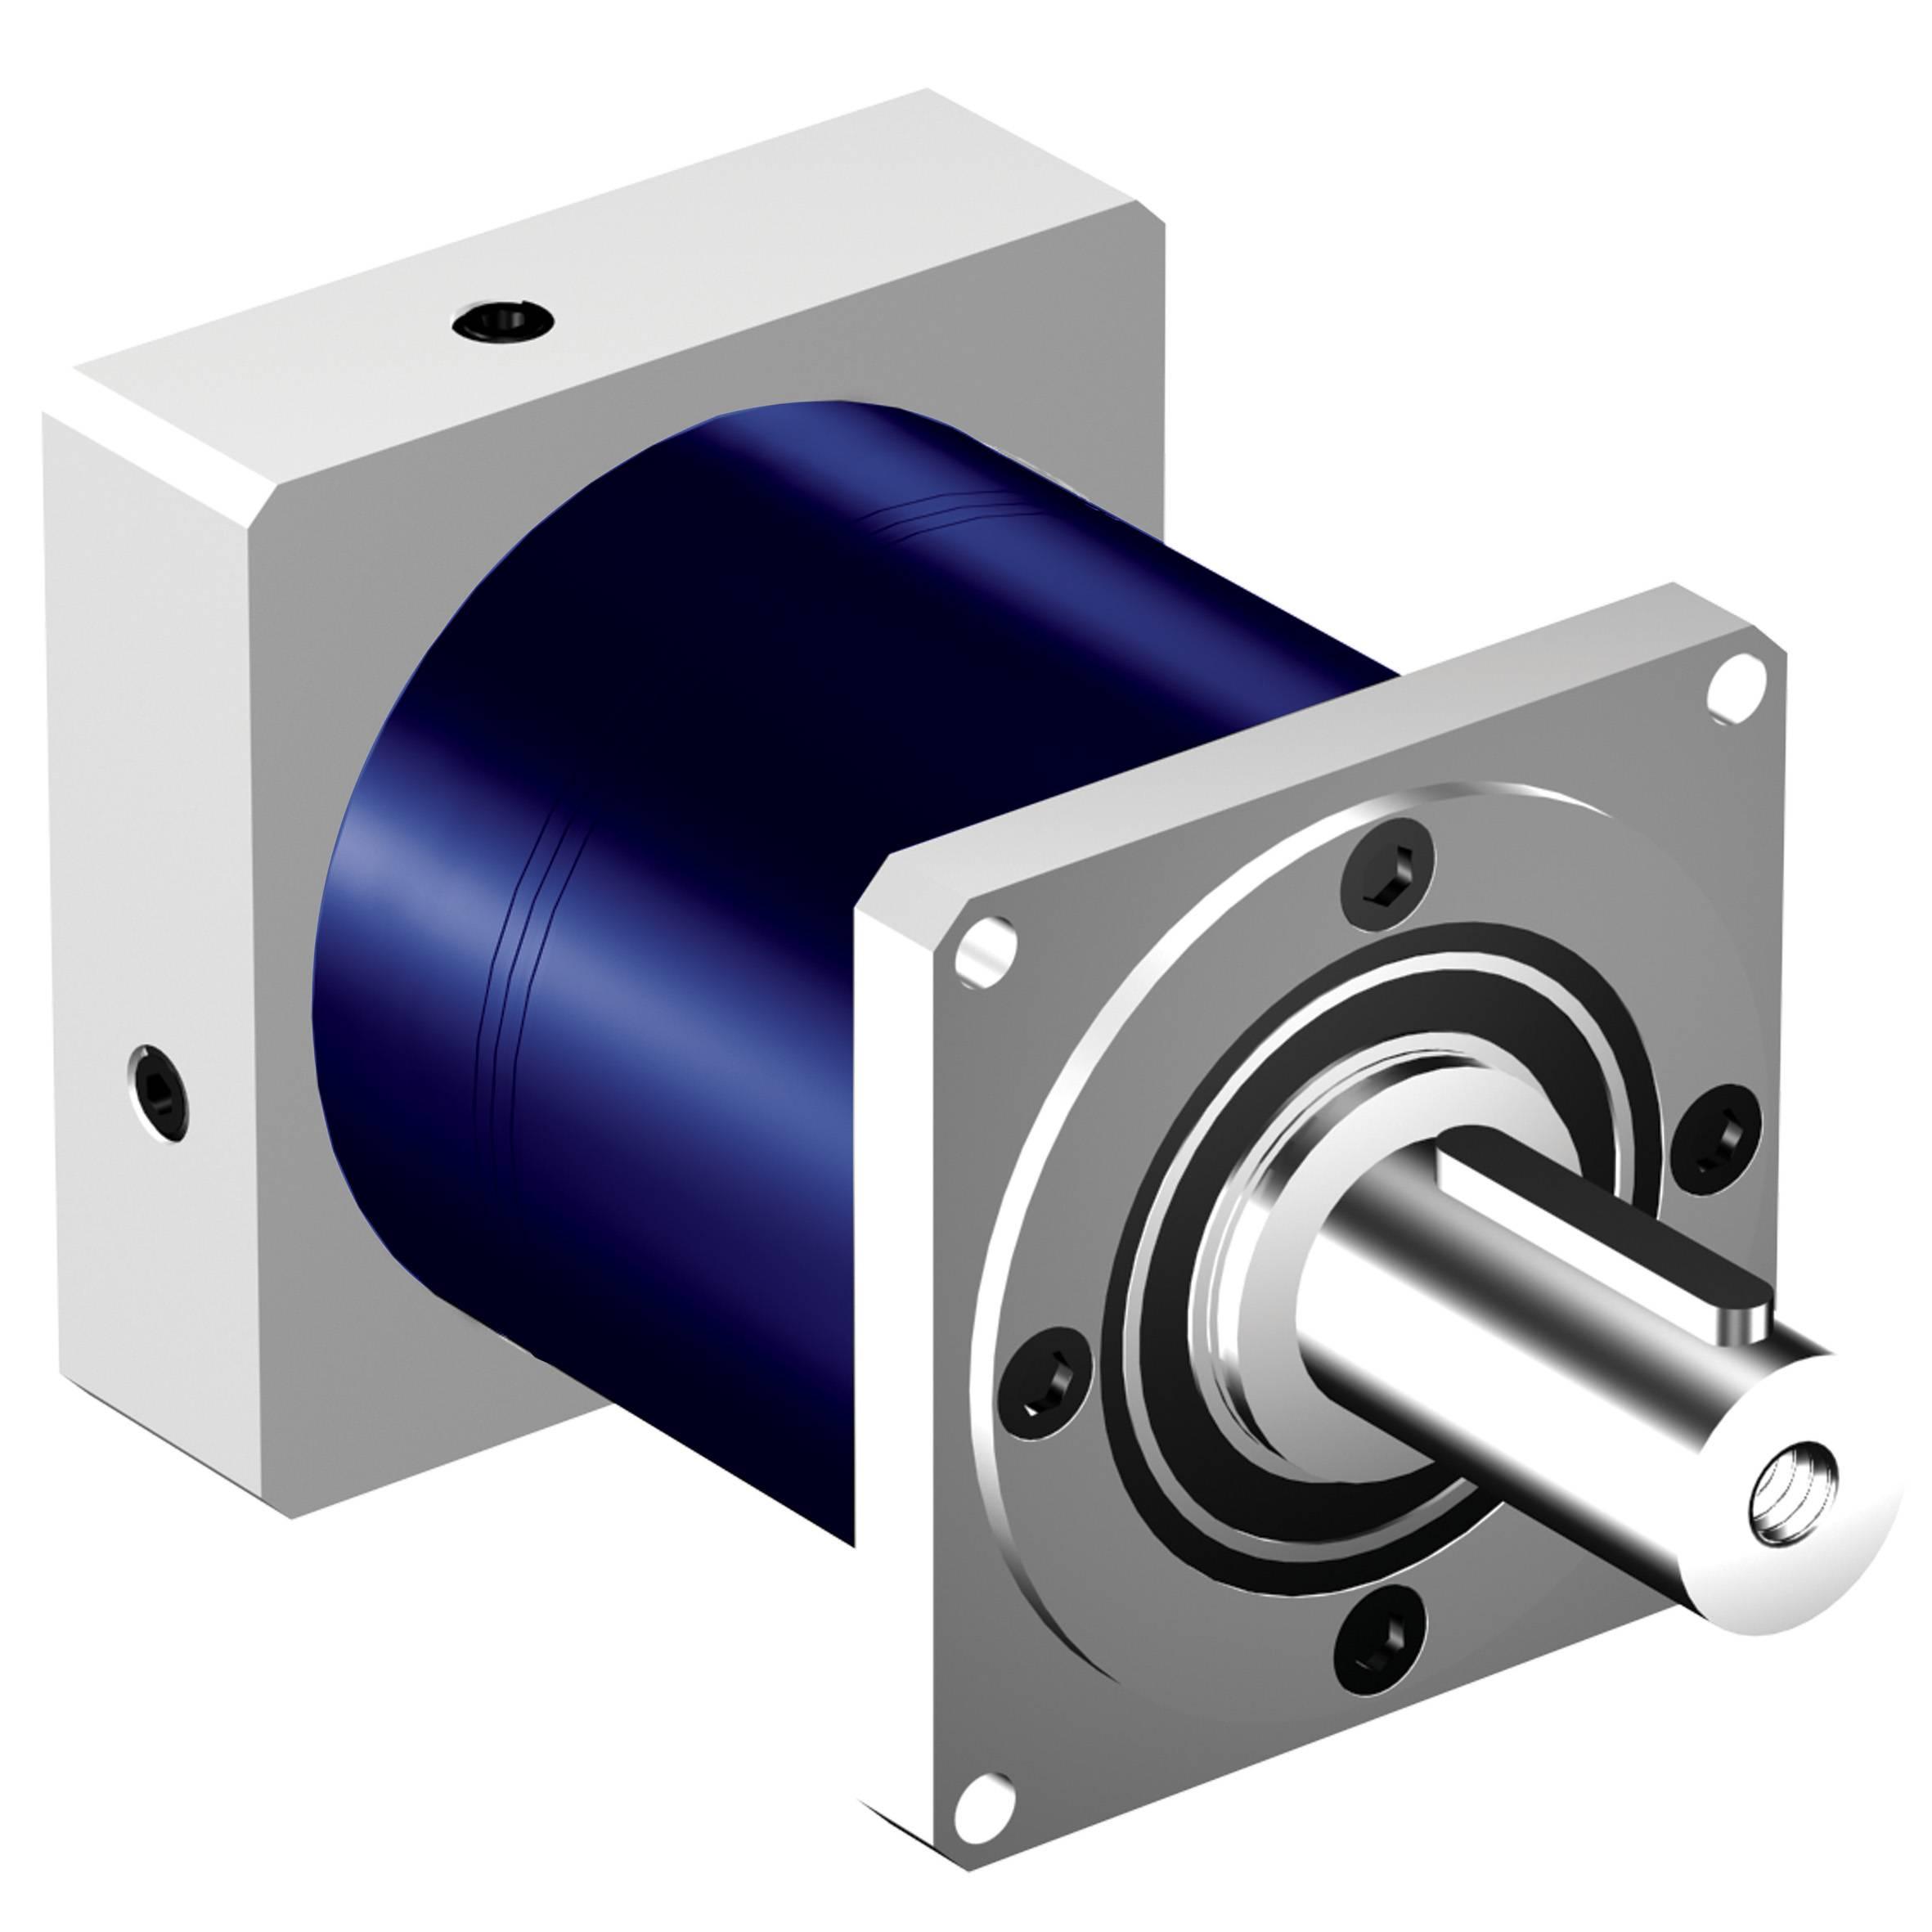 NEMA 23 mounting precision planetary gearbox